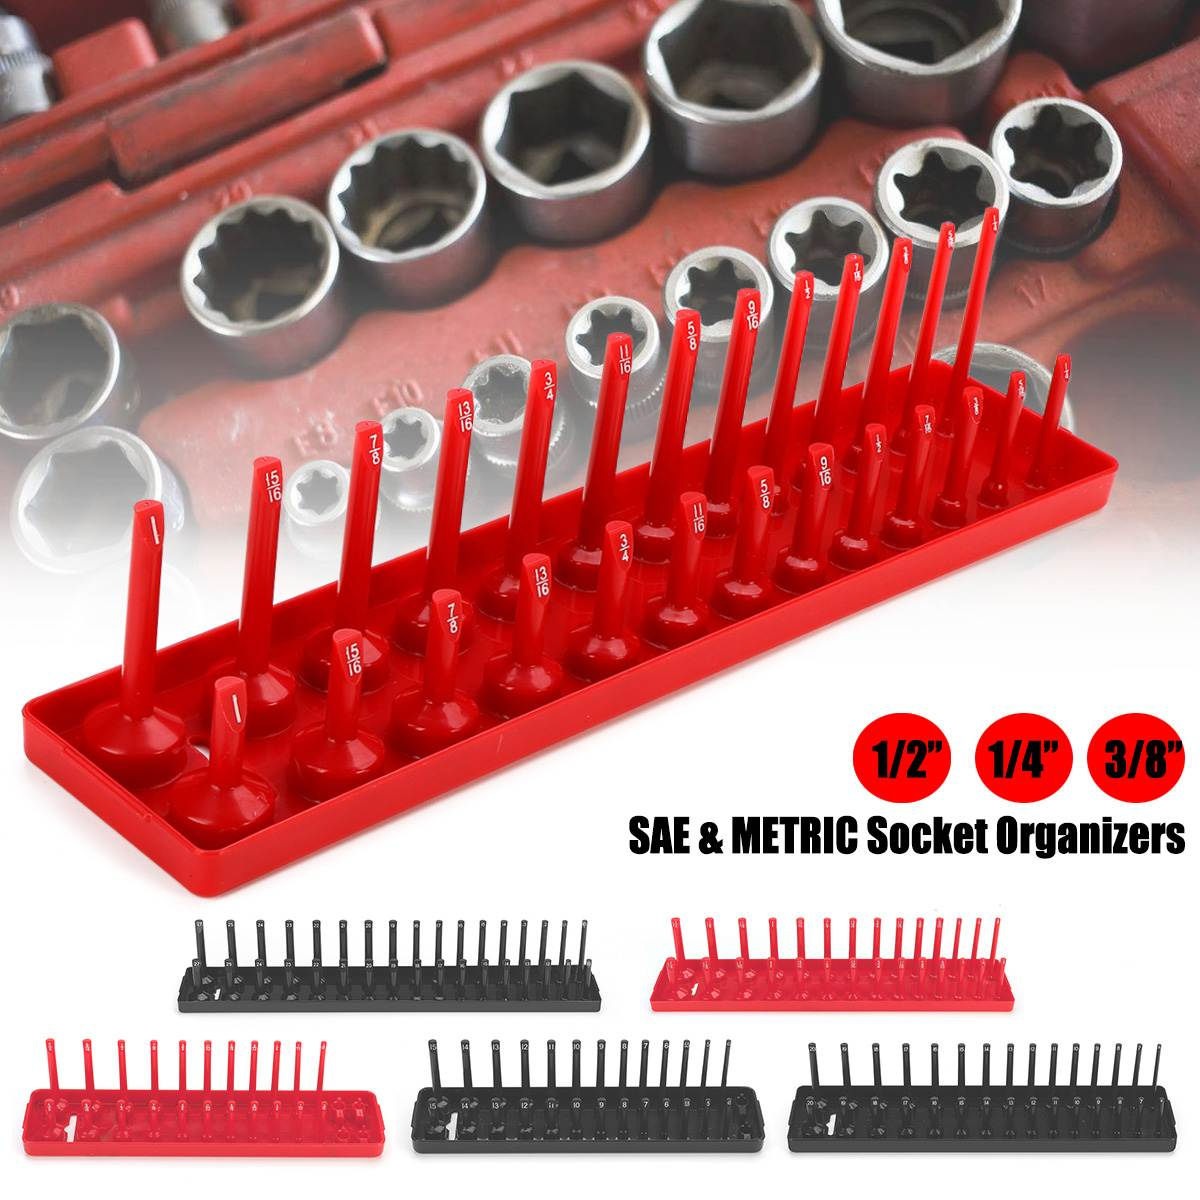 Pack of 6 Metric SAE Tray Socket Rack Storage Organizer Drive Rail Tool Kit New